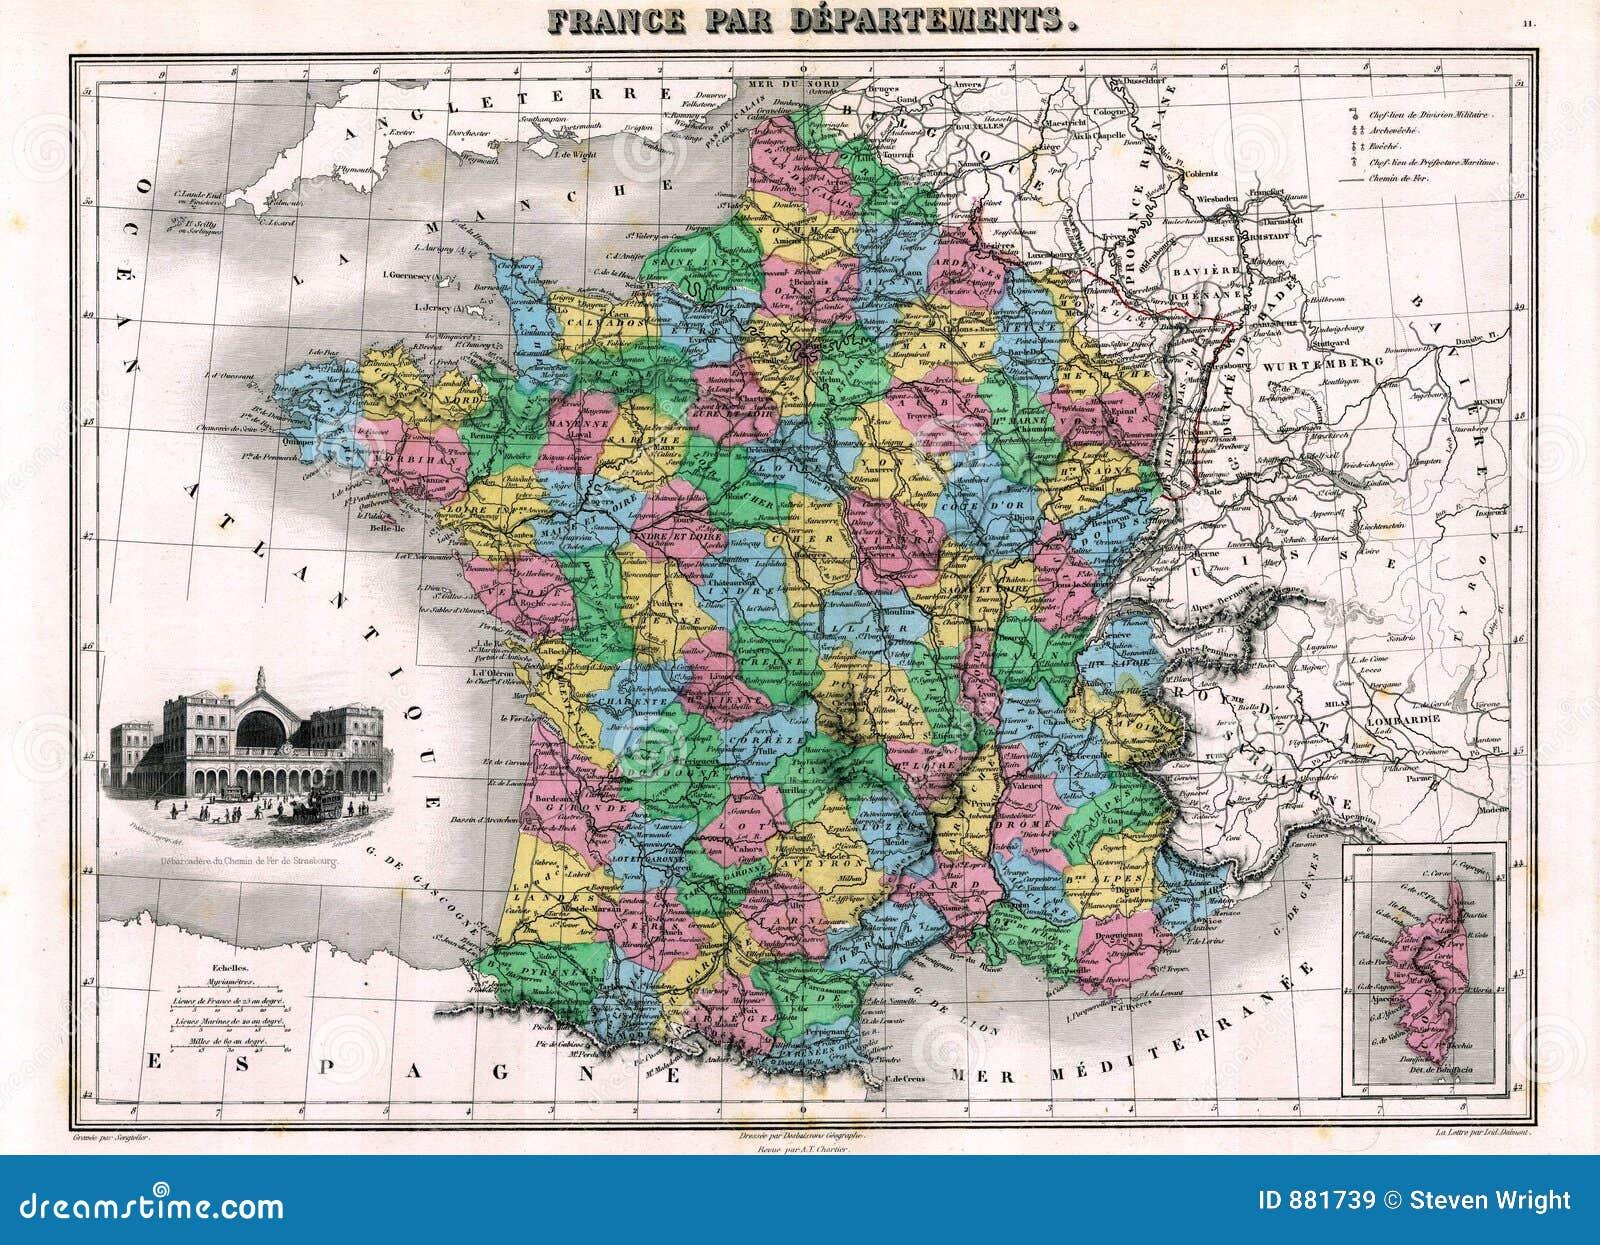 France road map frankreich karte download europakarte mit.